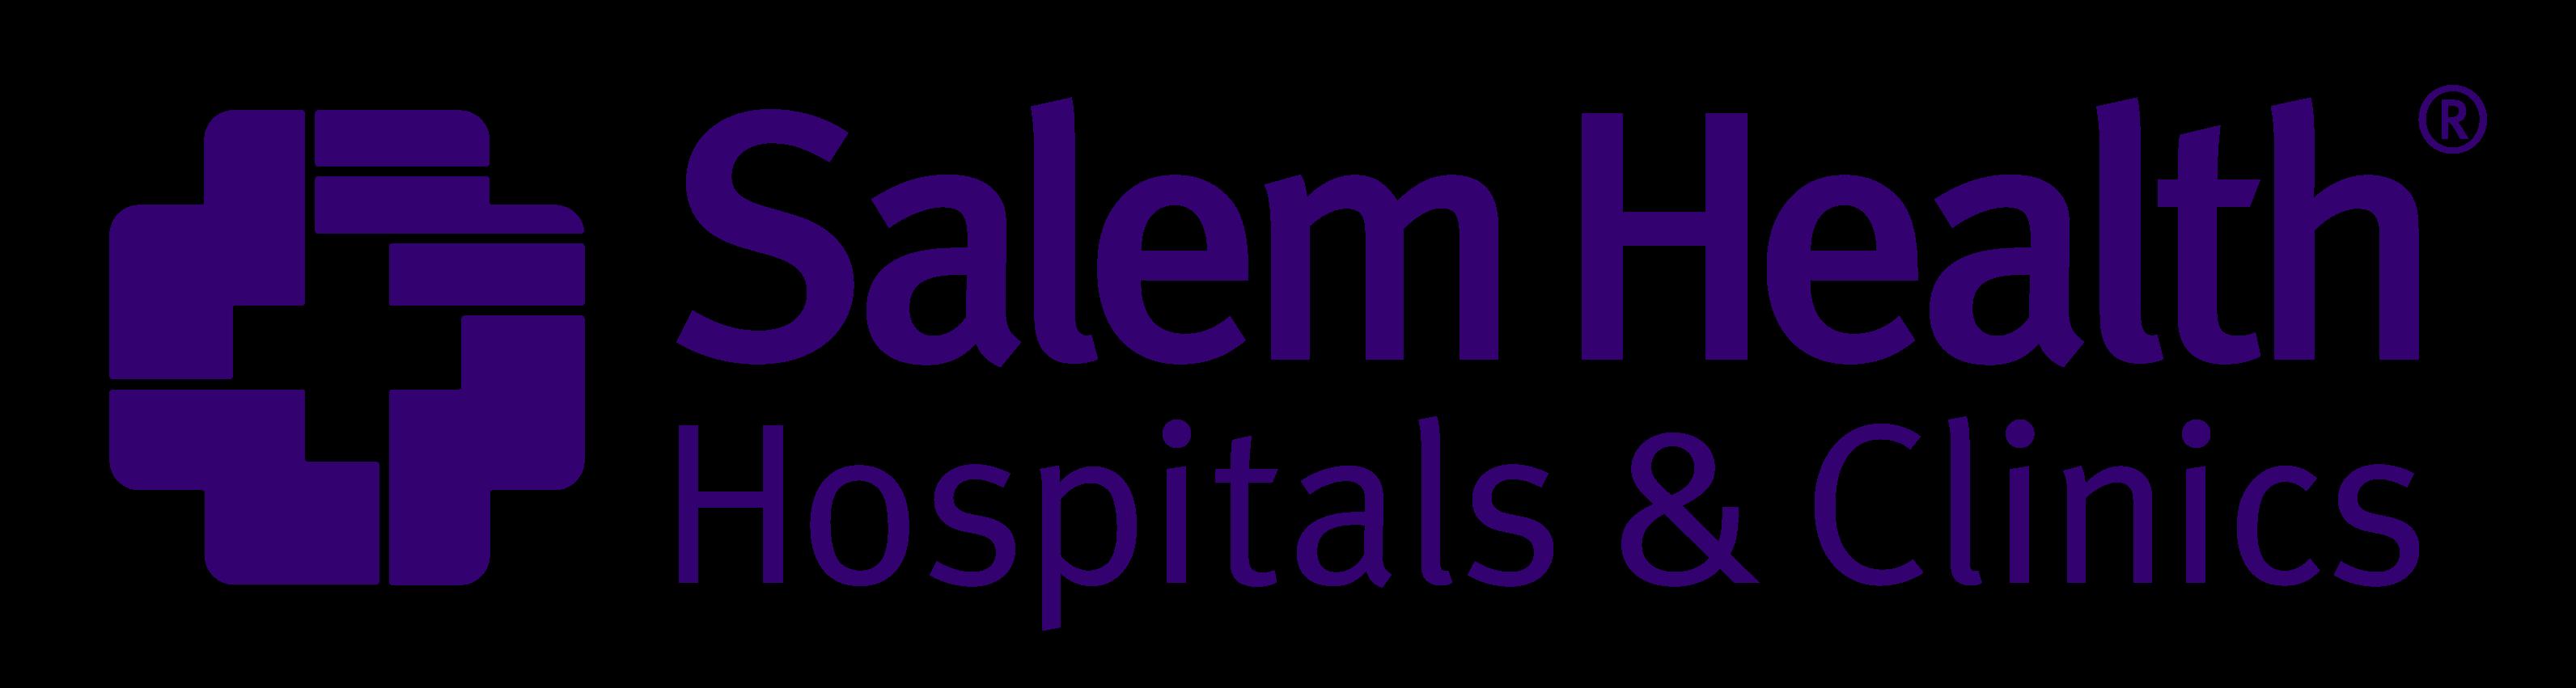 Salem Health Medical Clinic - 12th St   966 12th St SE #130, Salem, OR, 97302   +1 (503) 814-4400